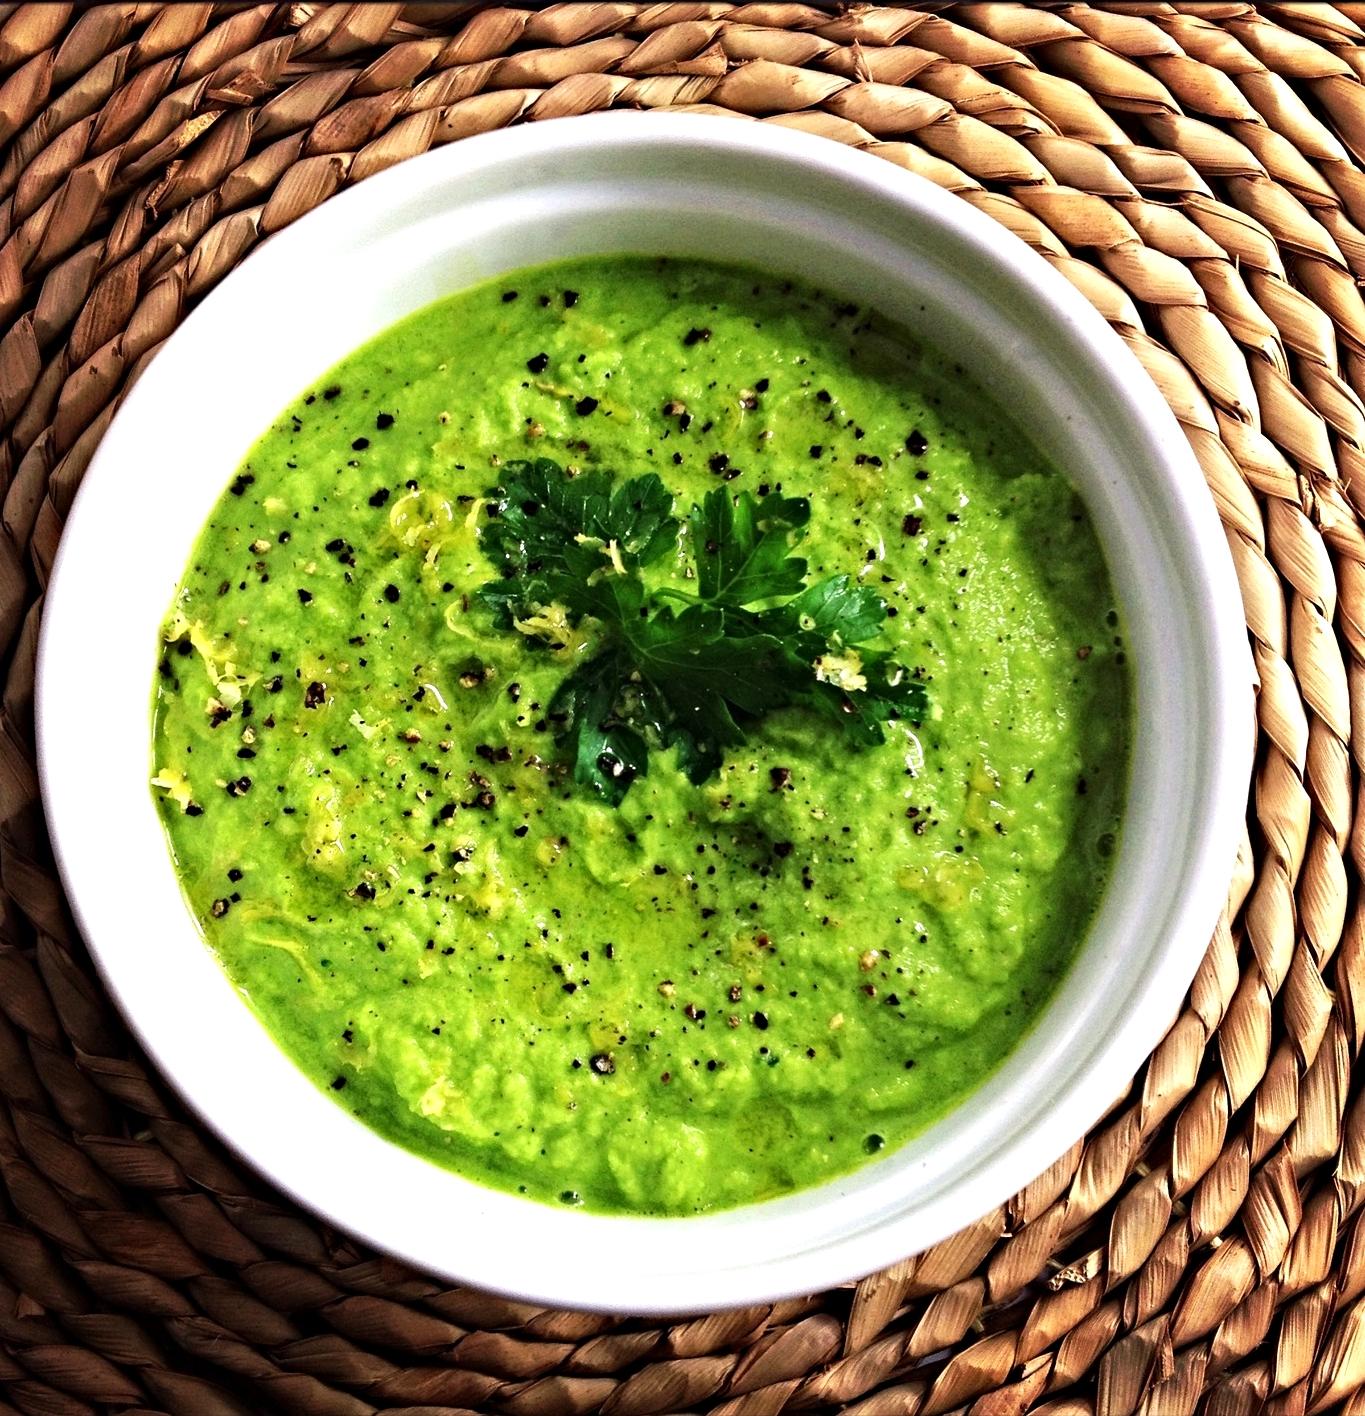 Broccoli Herb Soup